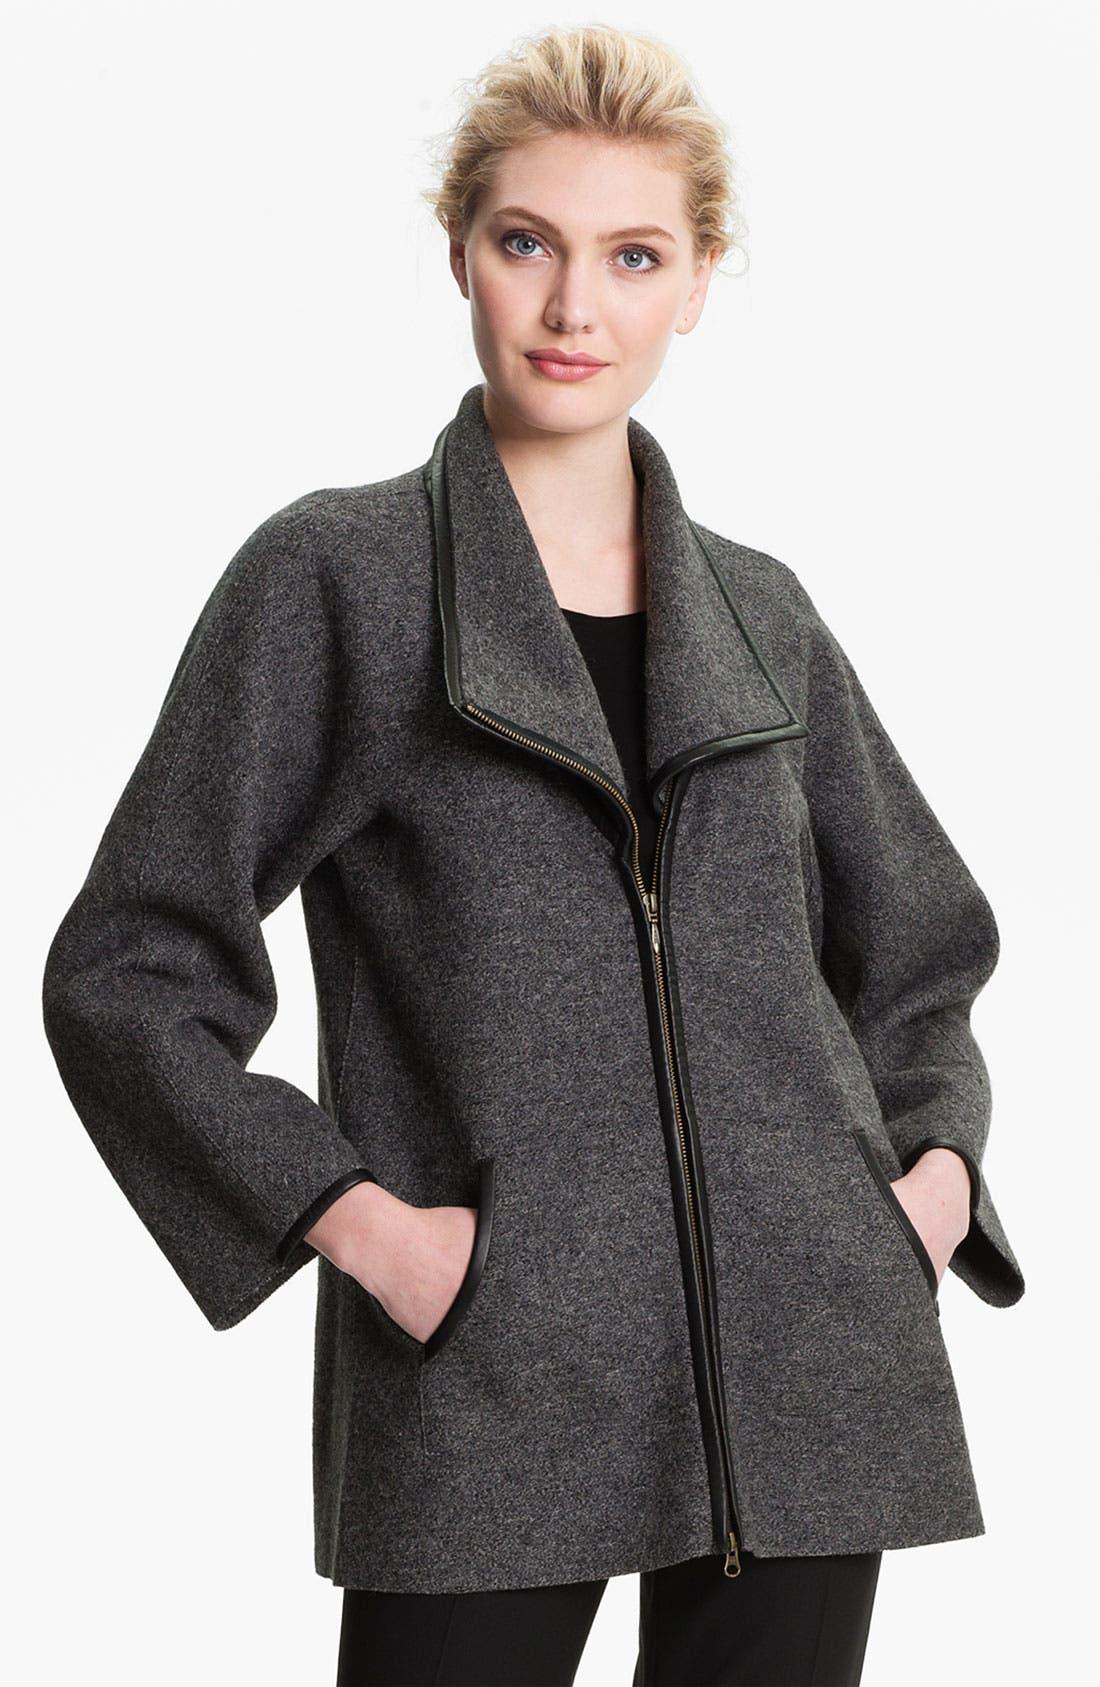 Main Image - Beyond Threads 'Corina' Alpaca Blend Jacket